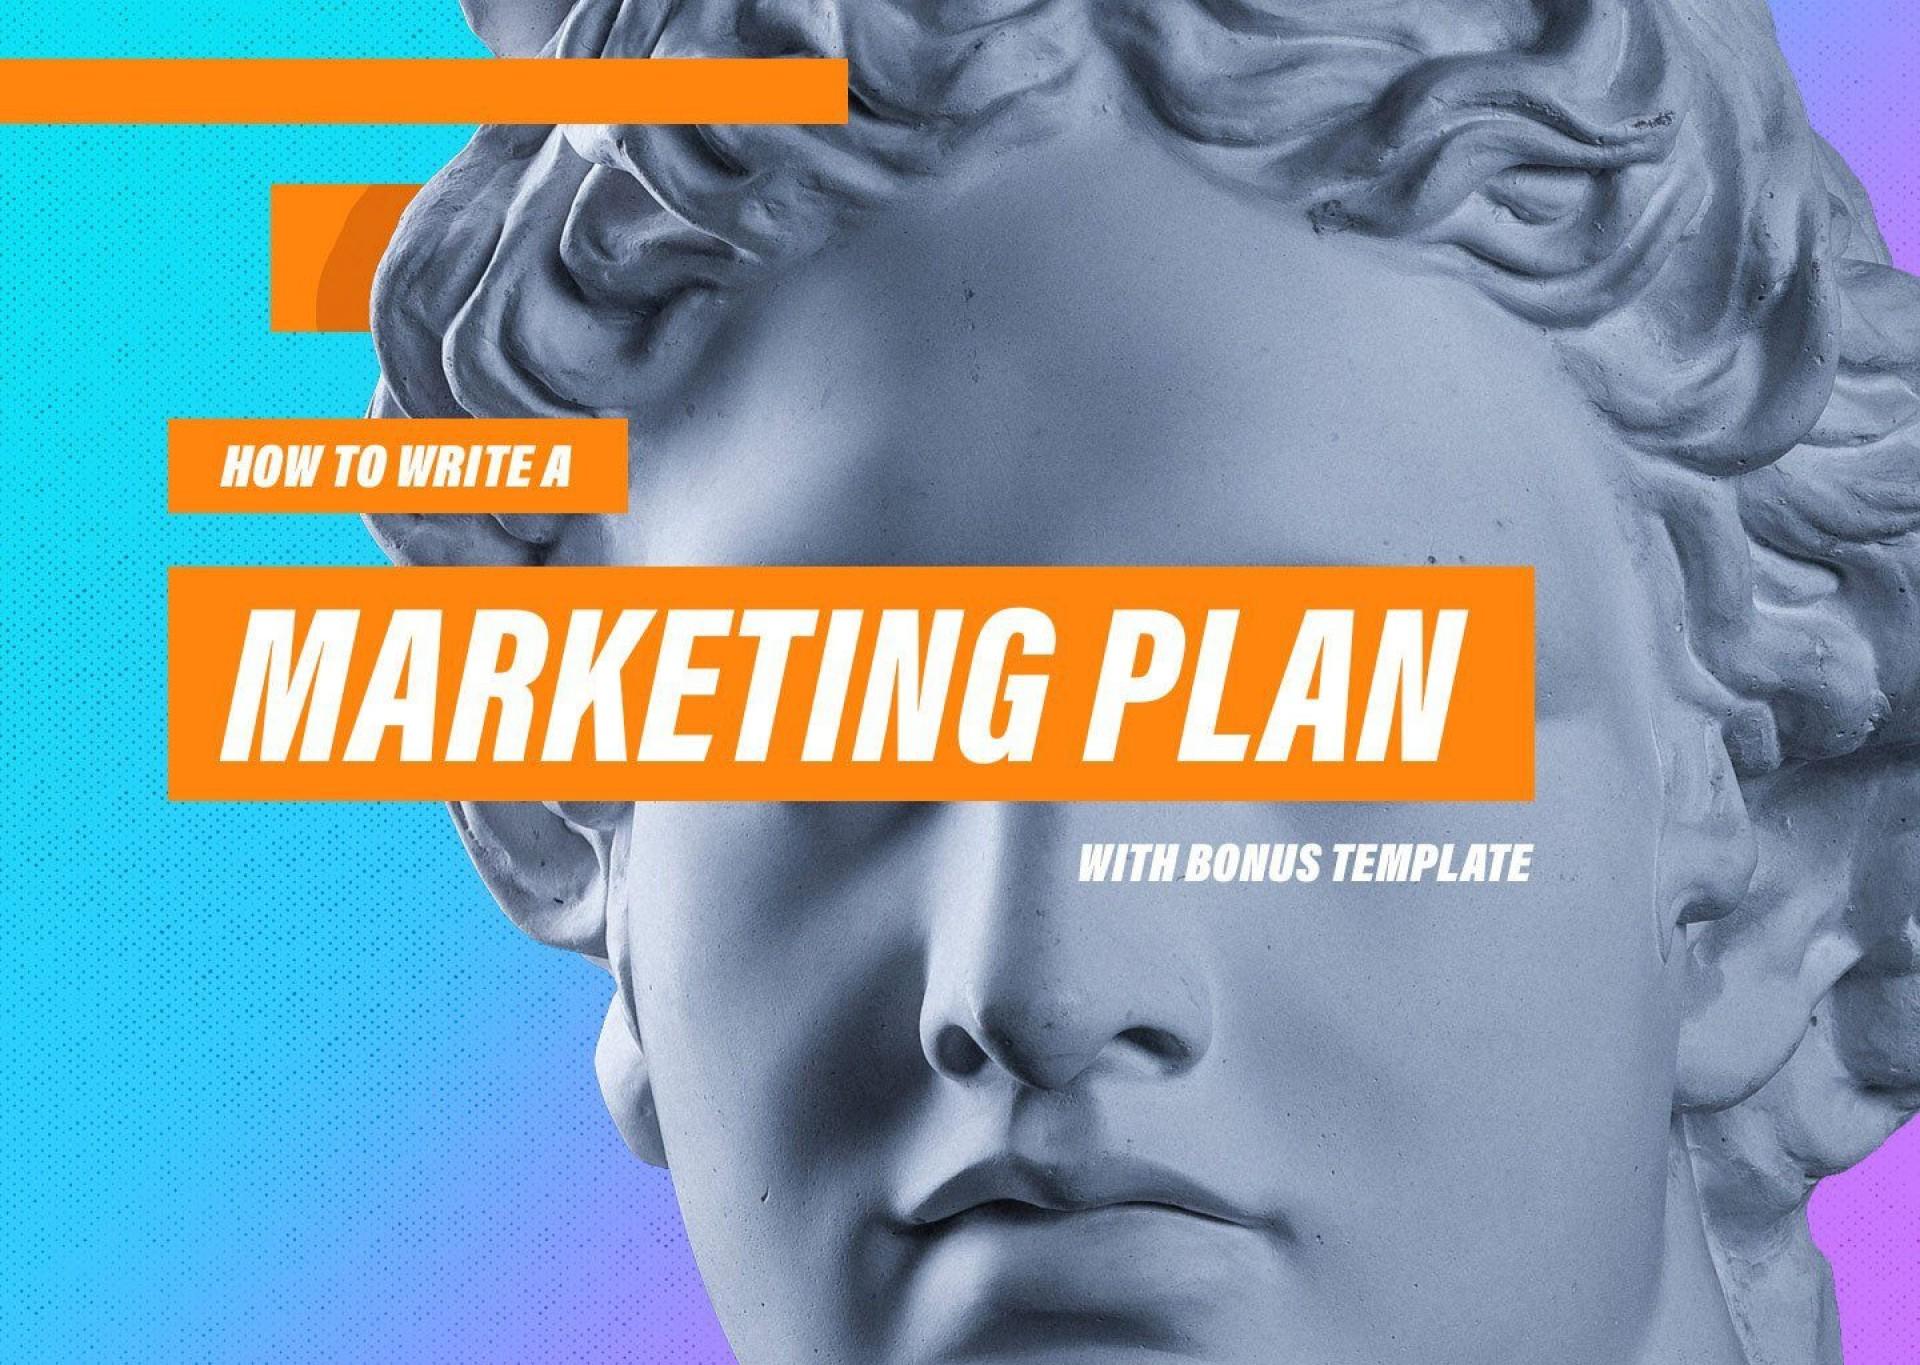 009 Unique Digital Marketing Plan Template Word Photo 1920